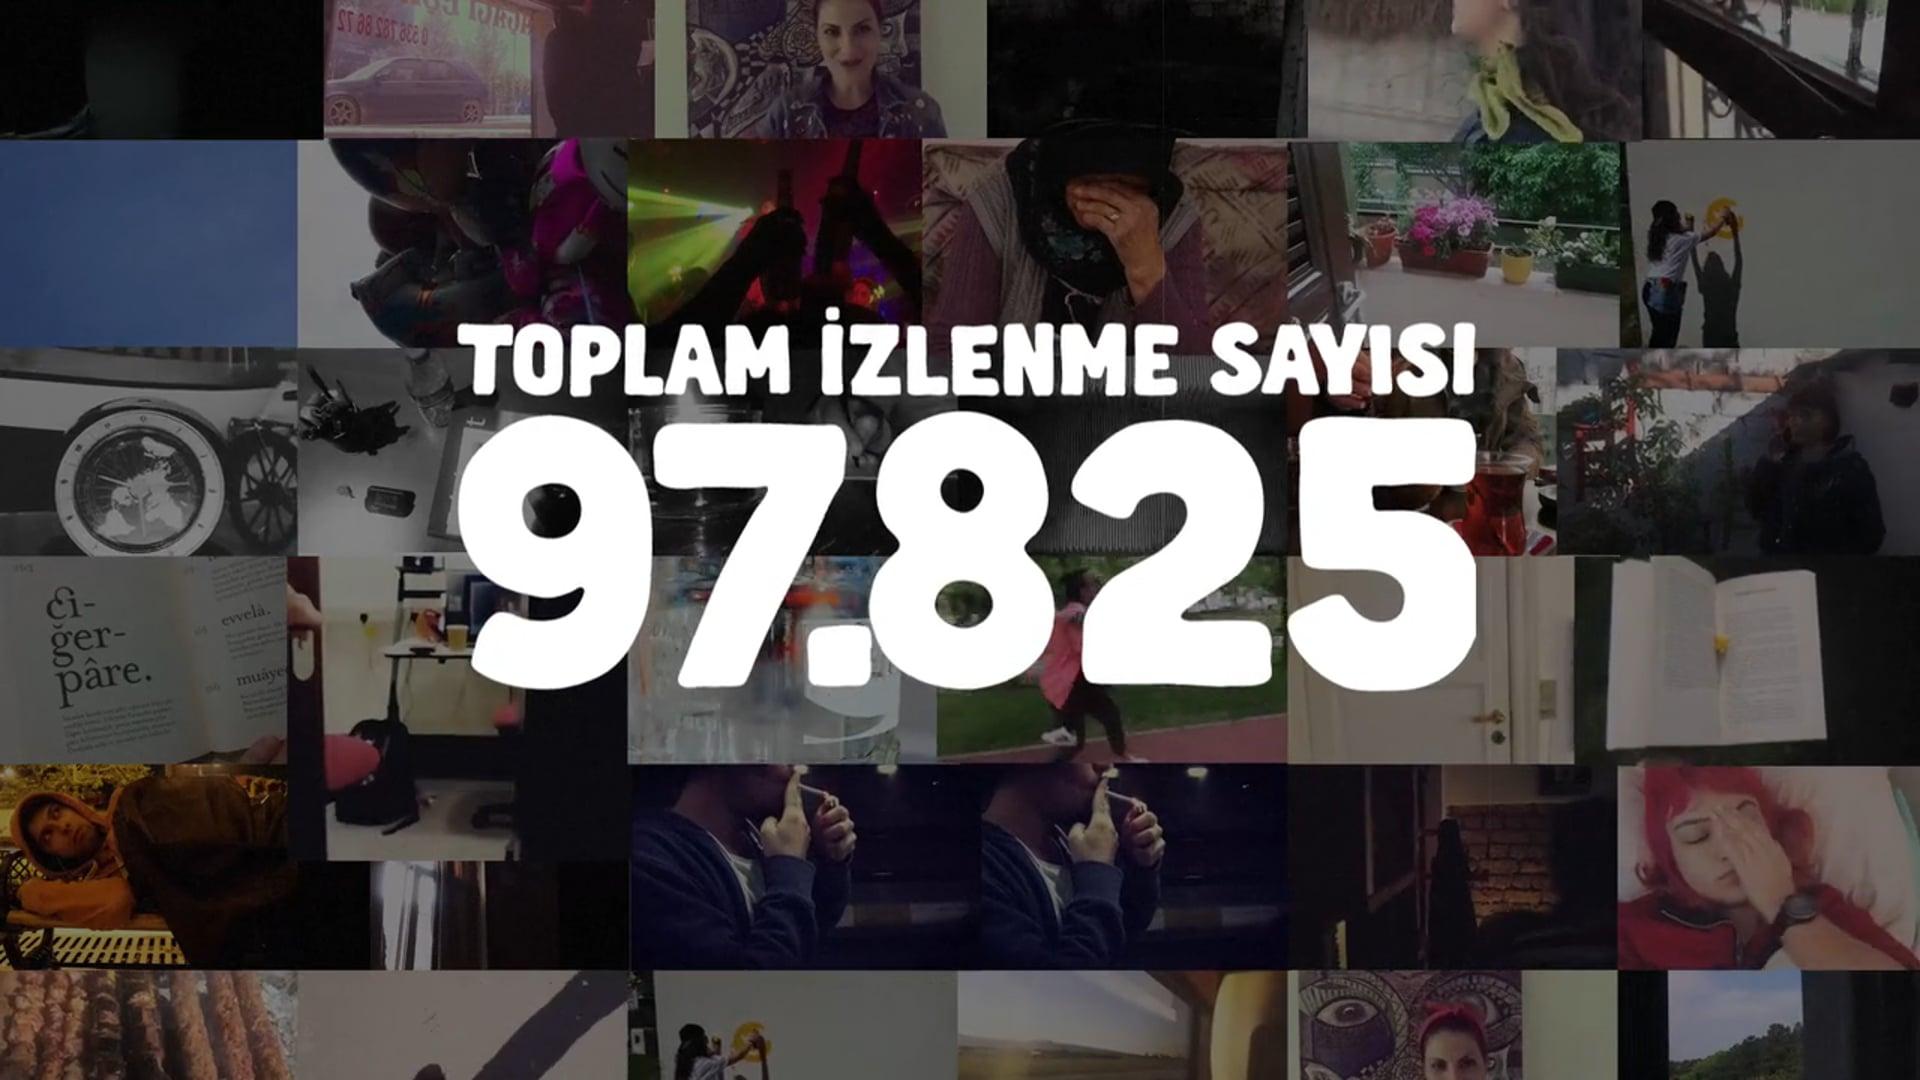 Akbank Sanat #FİLMOLSUN